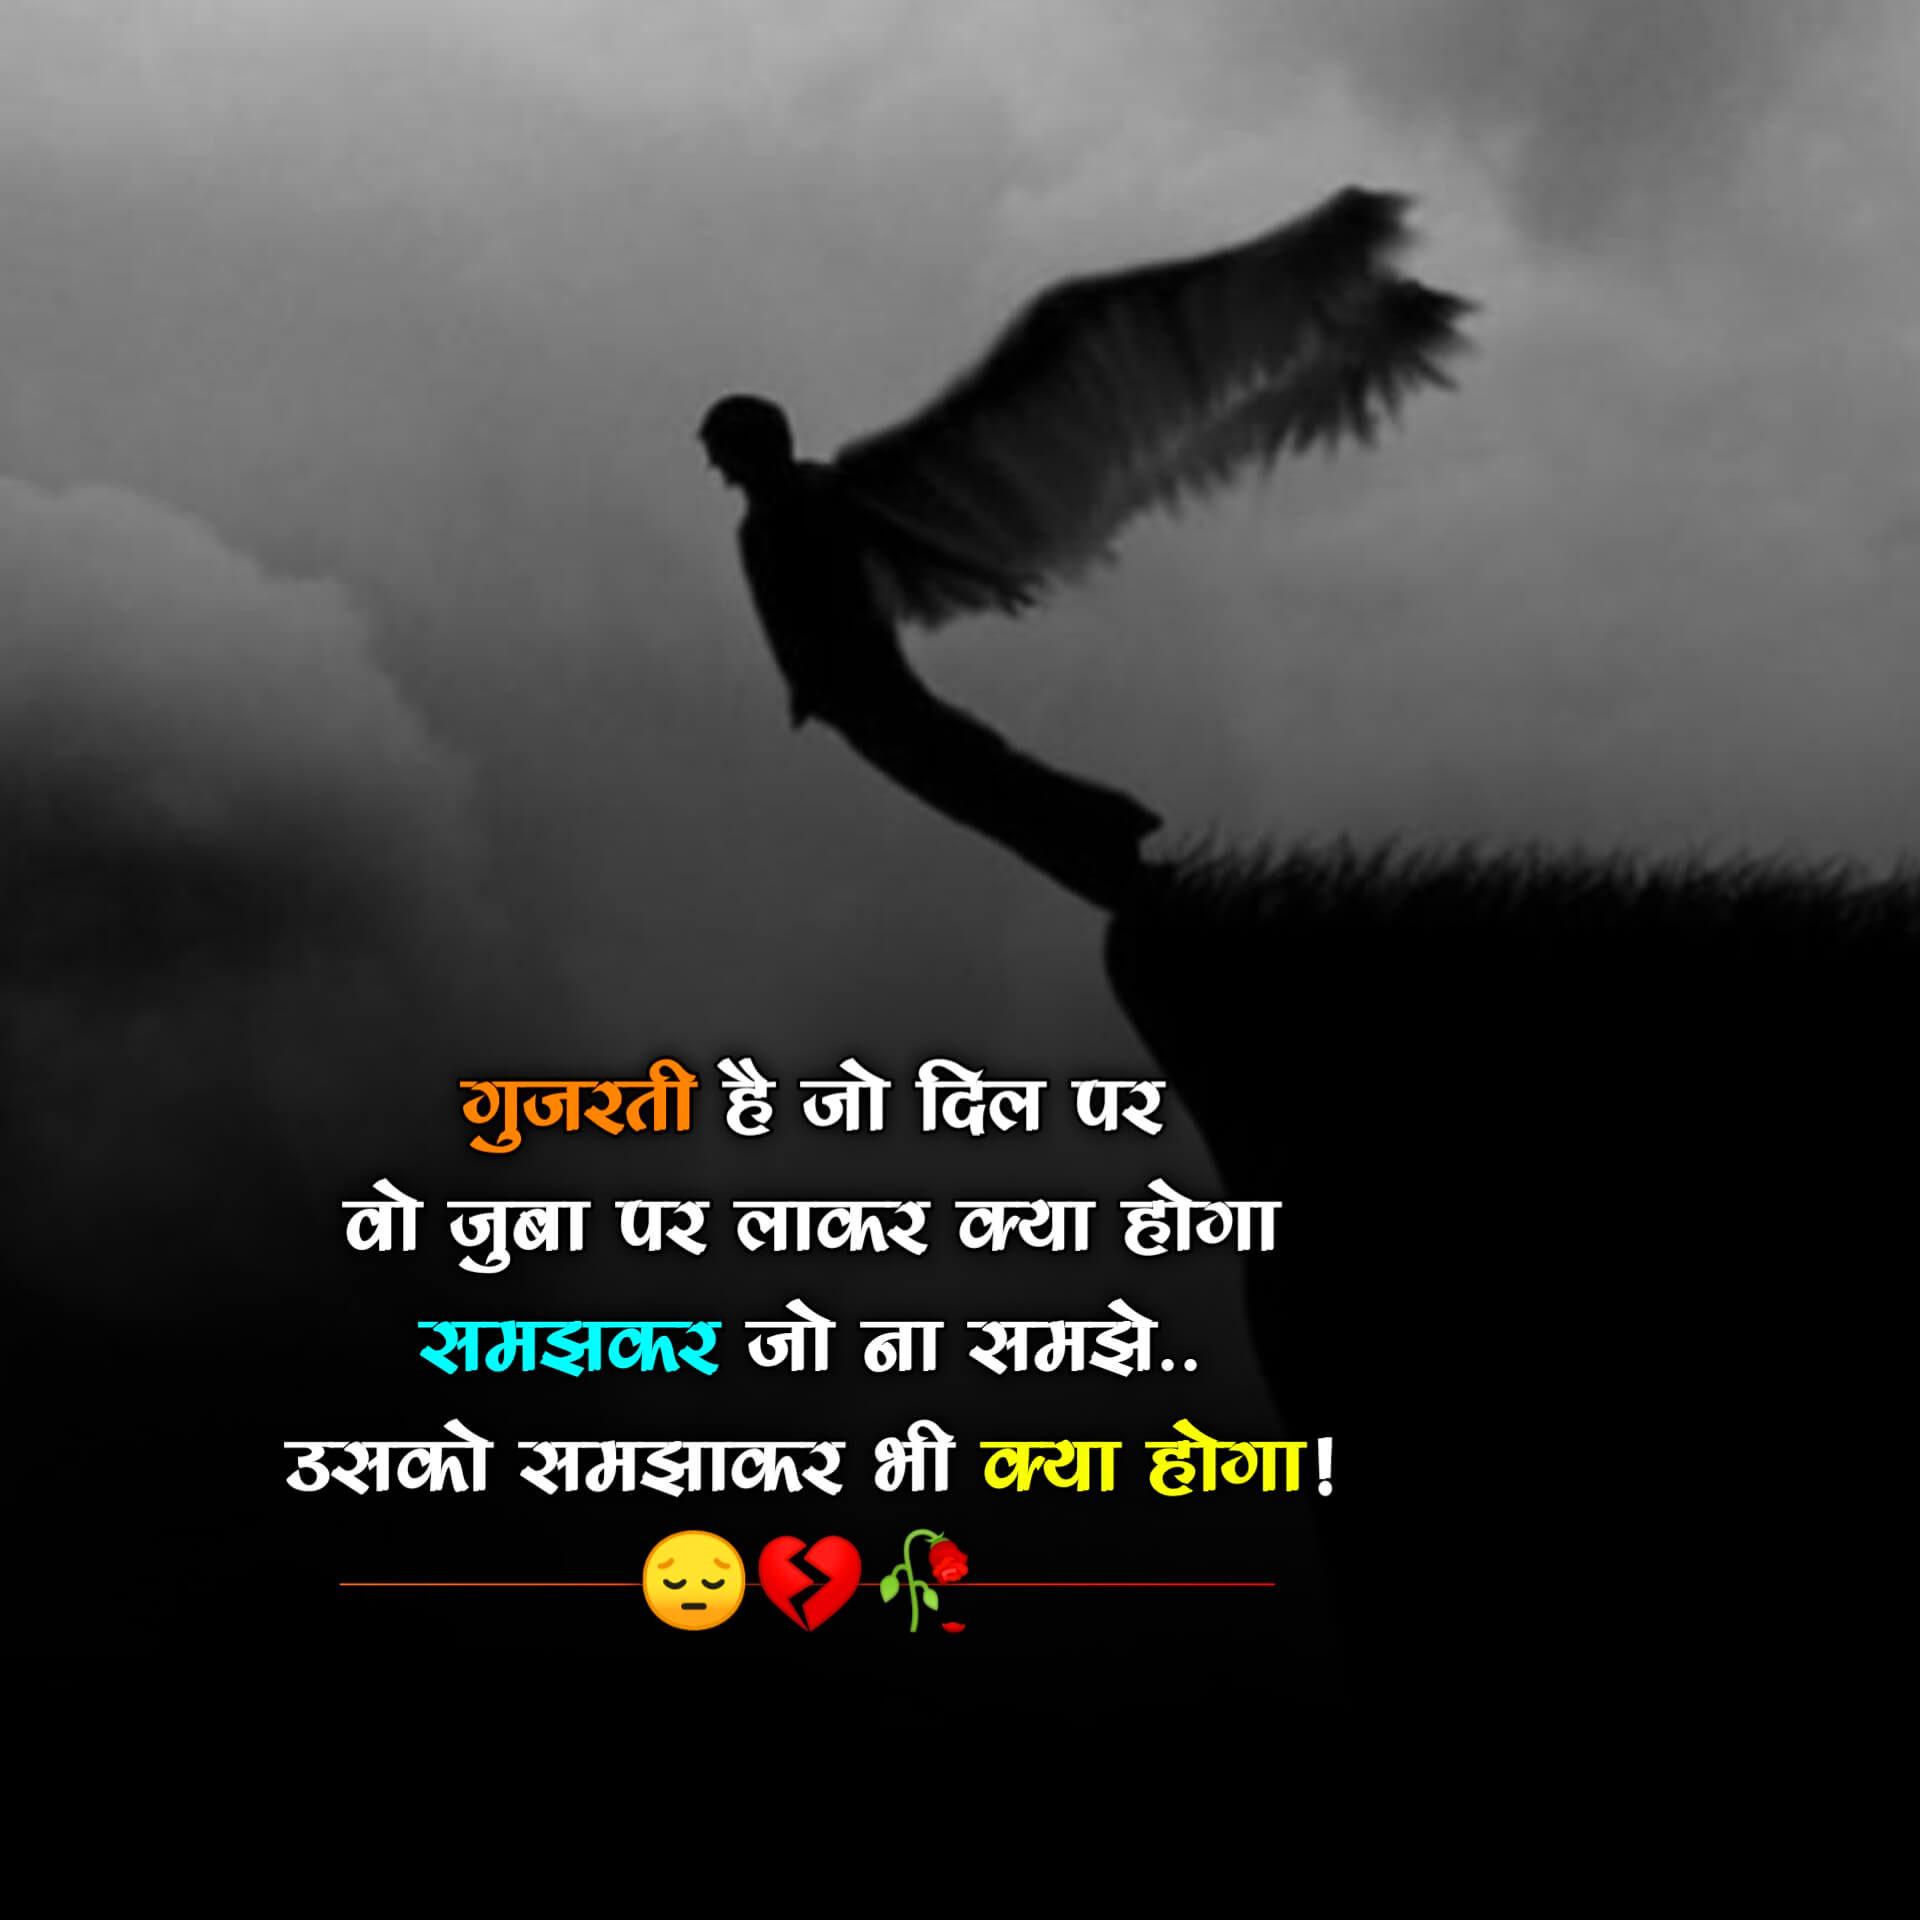 New Sad Boy Shayari Images pics hd download